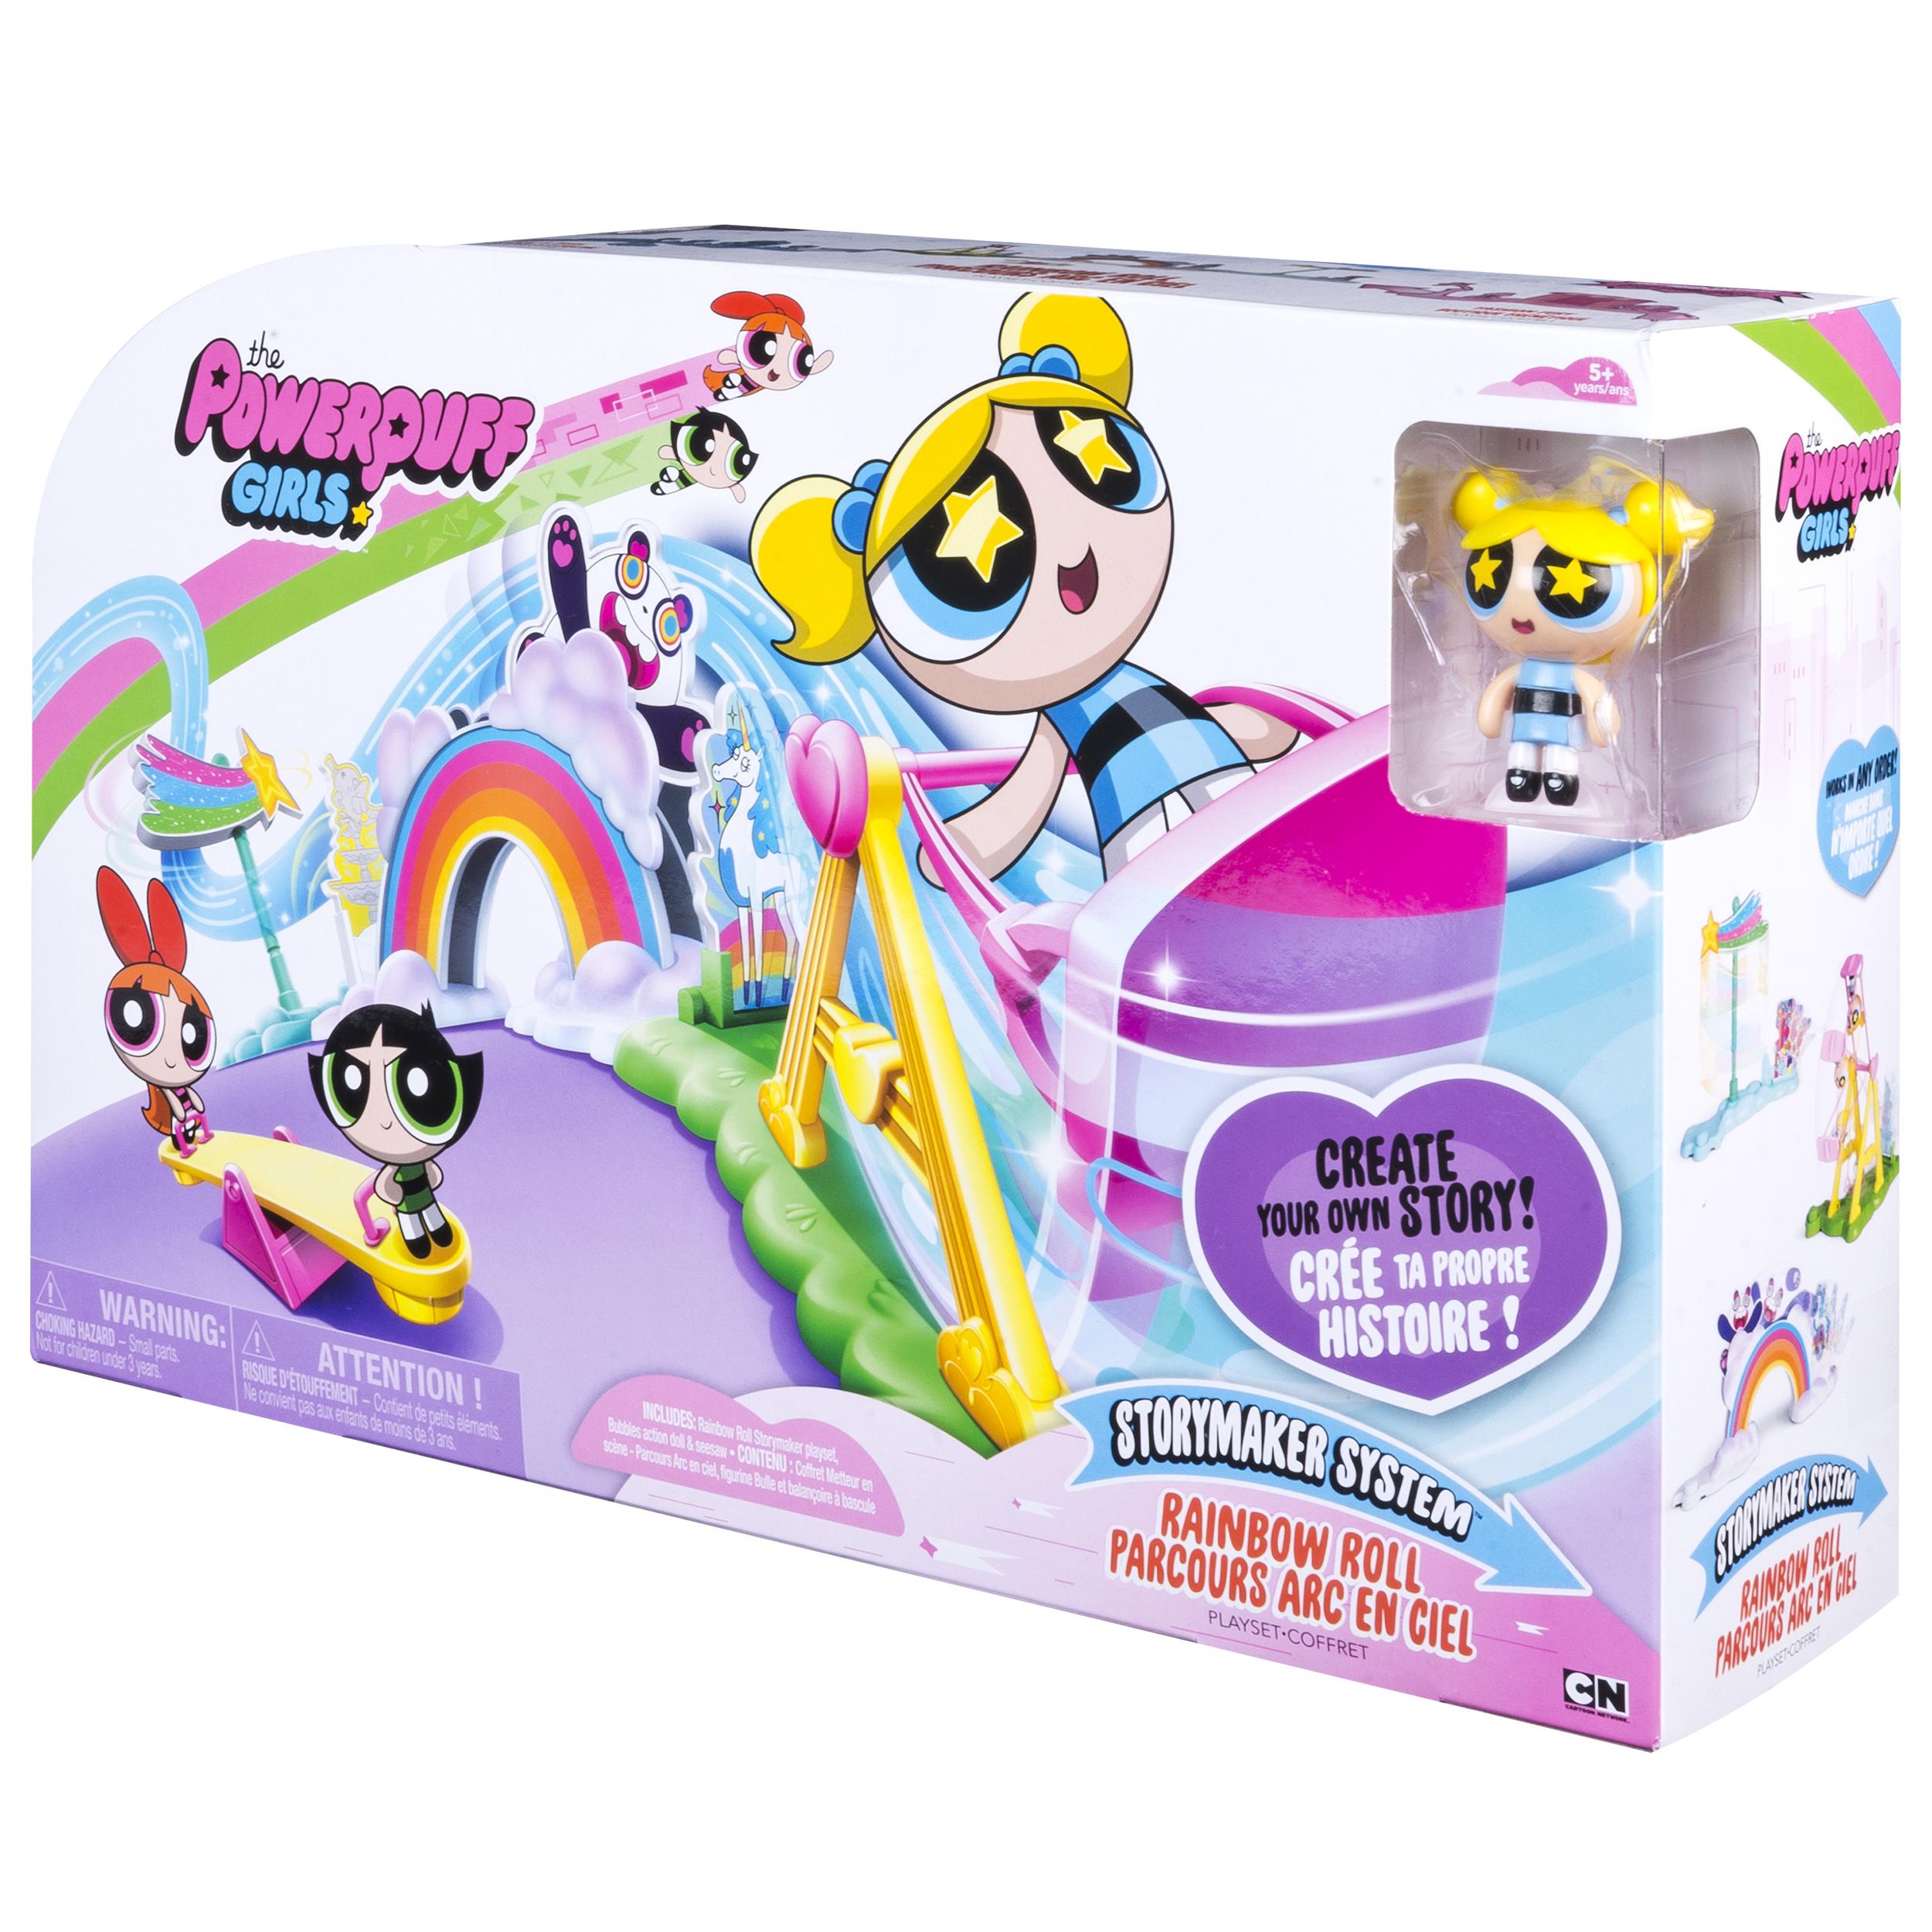 Powerpuff Girls Bedroom Powerpuff Girls Storymaker System Rainbow Roll Playset